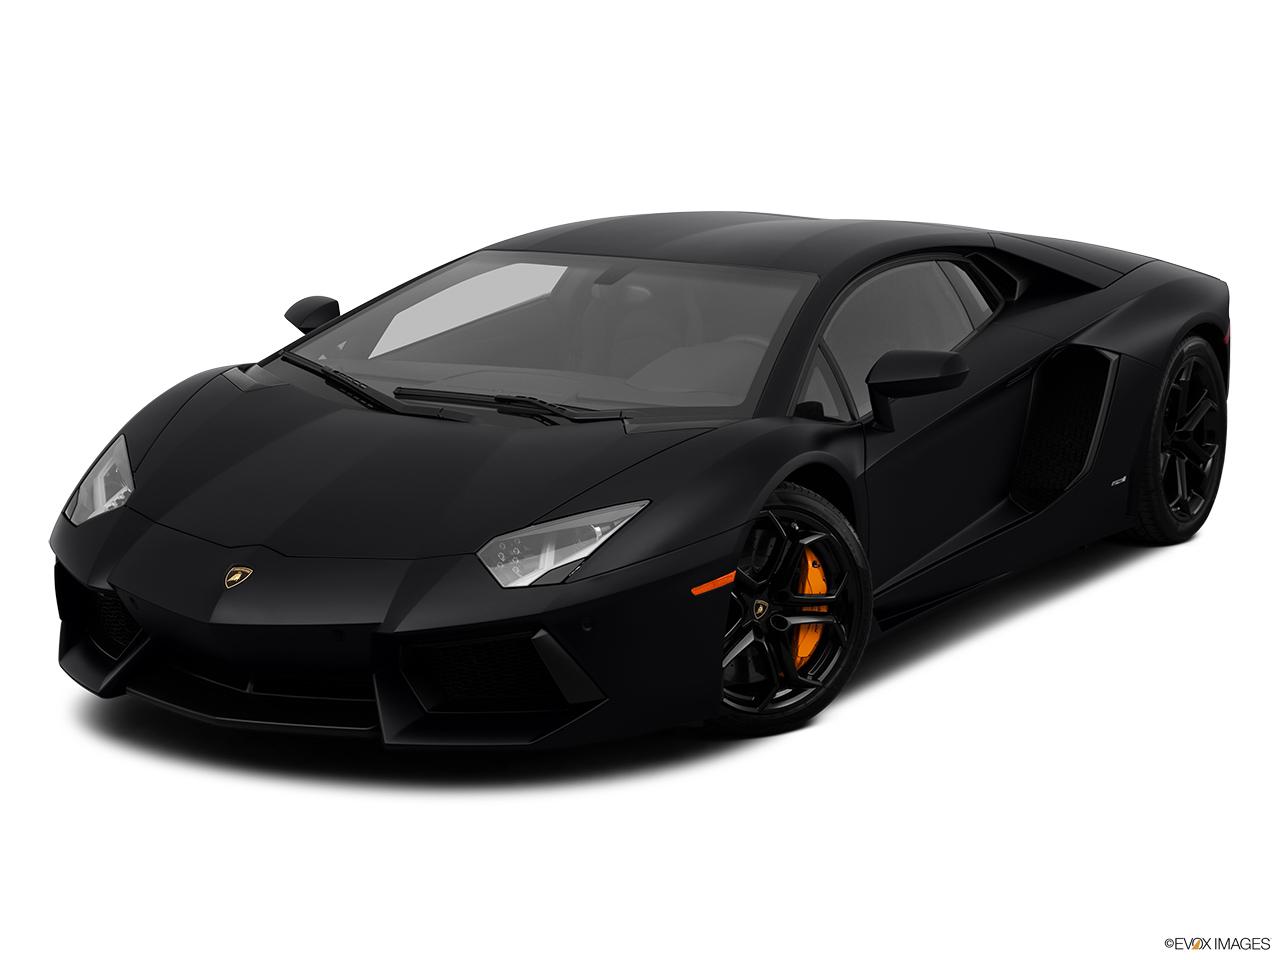 2013 Lamborghini Aventador Coupe - Front angle view